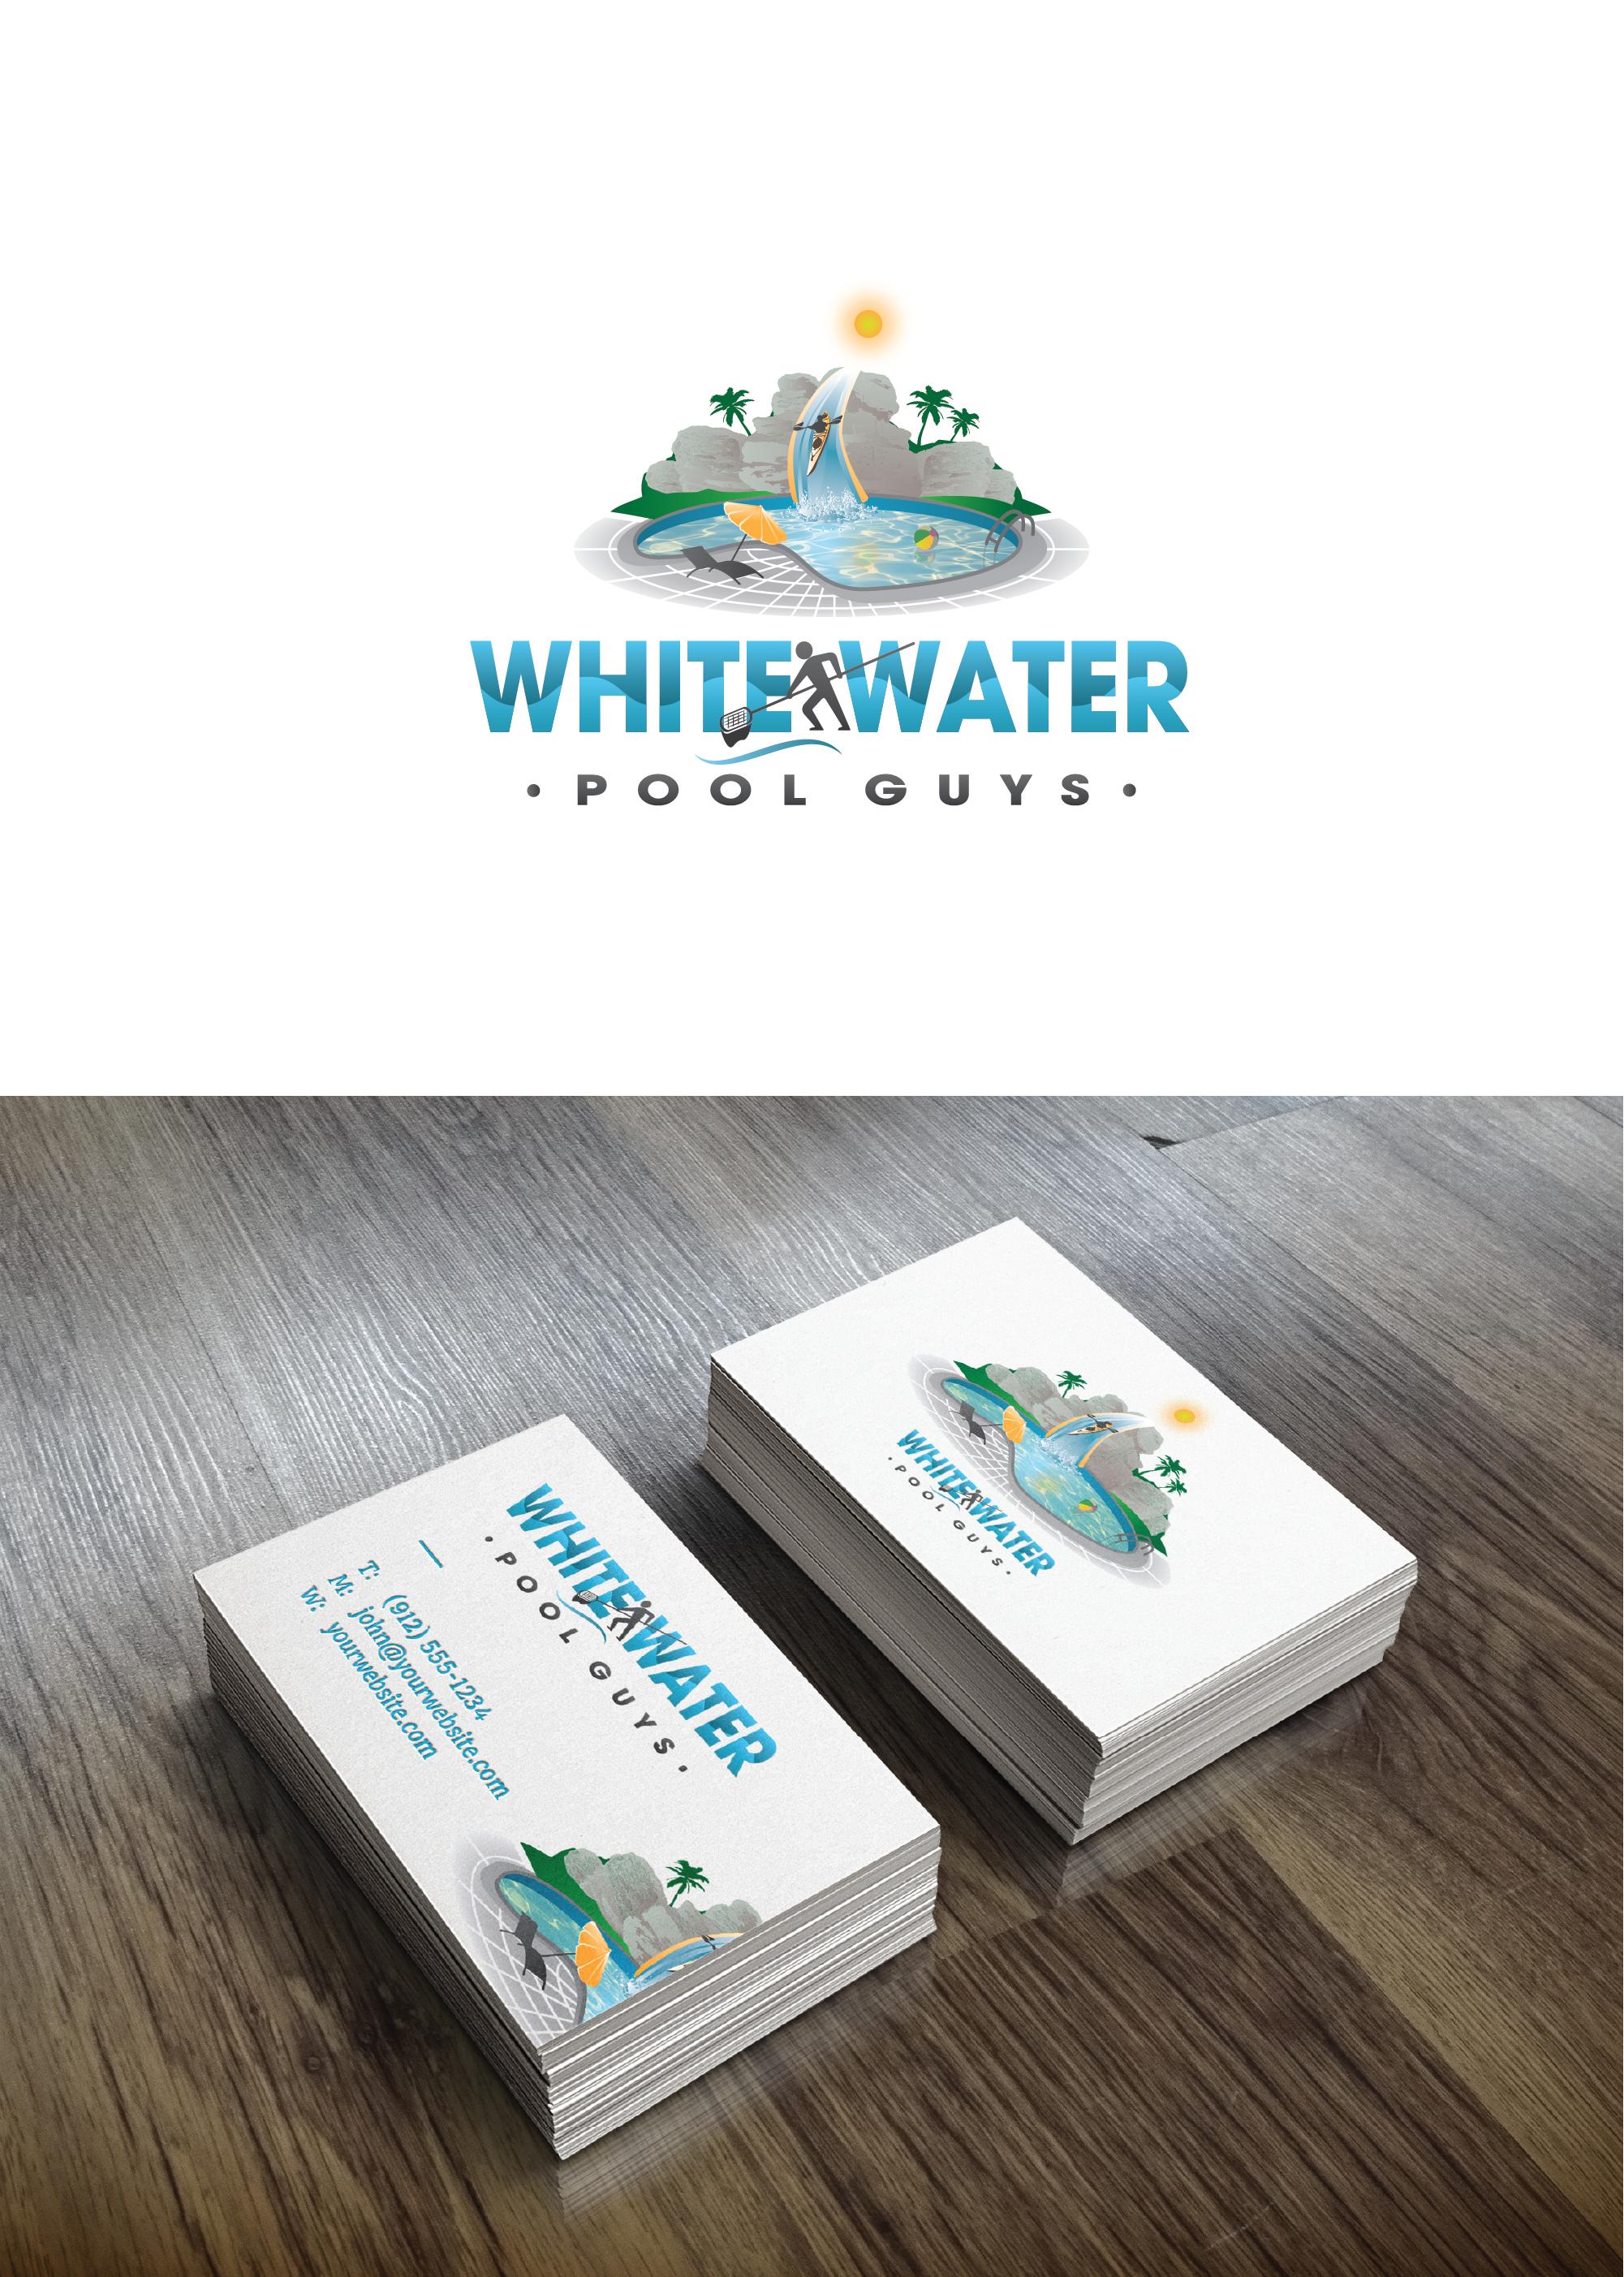 Draw/Design a Creative Logo for a Pool Company